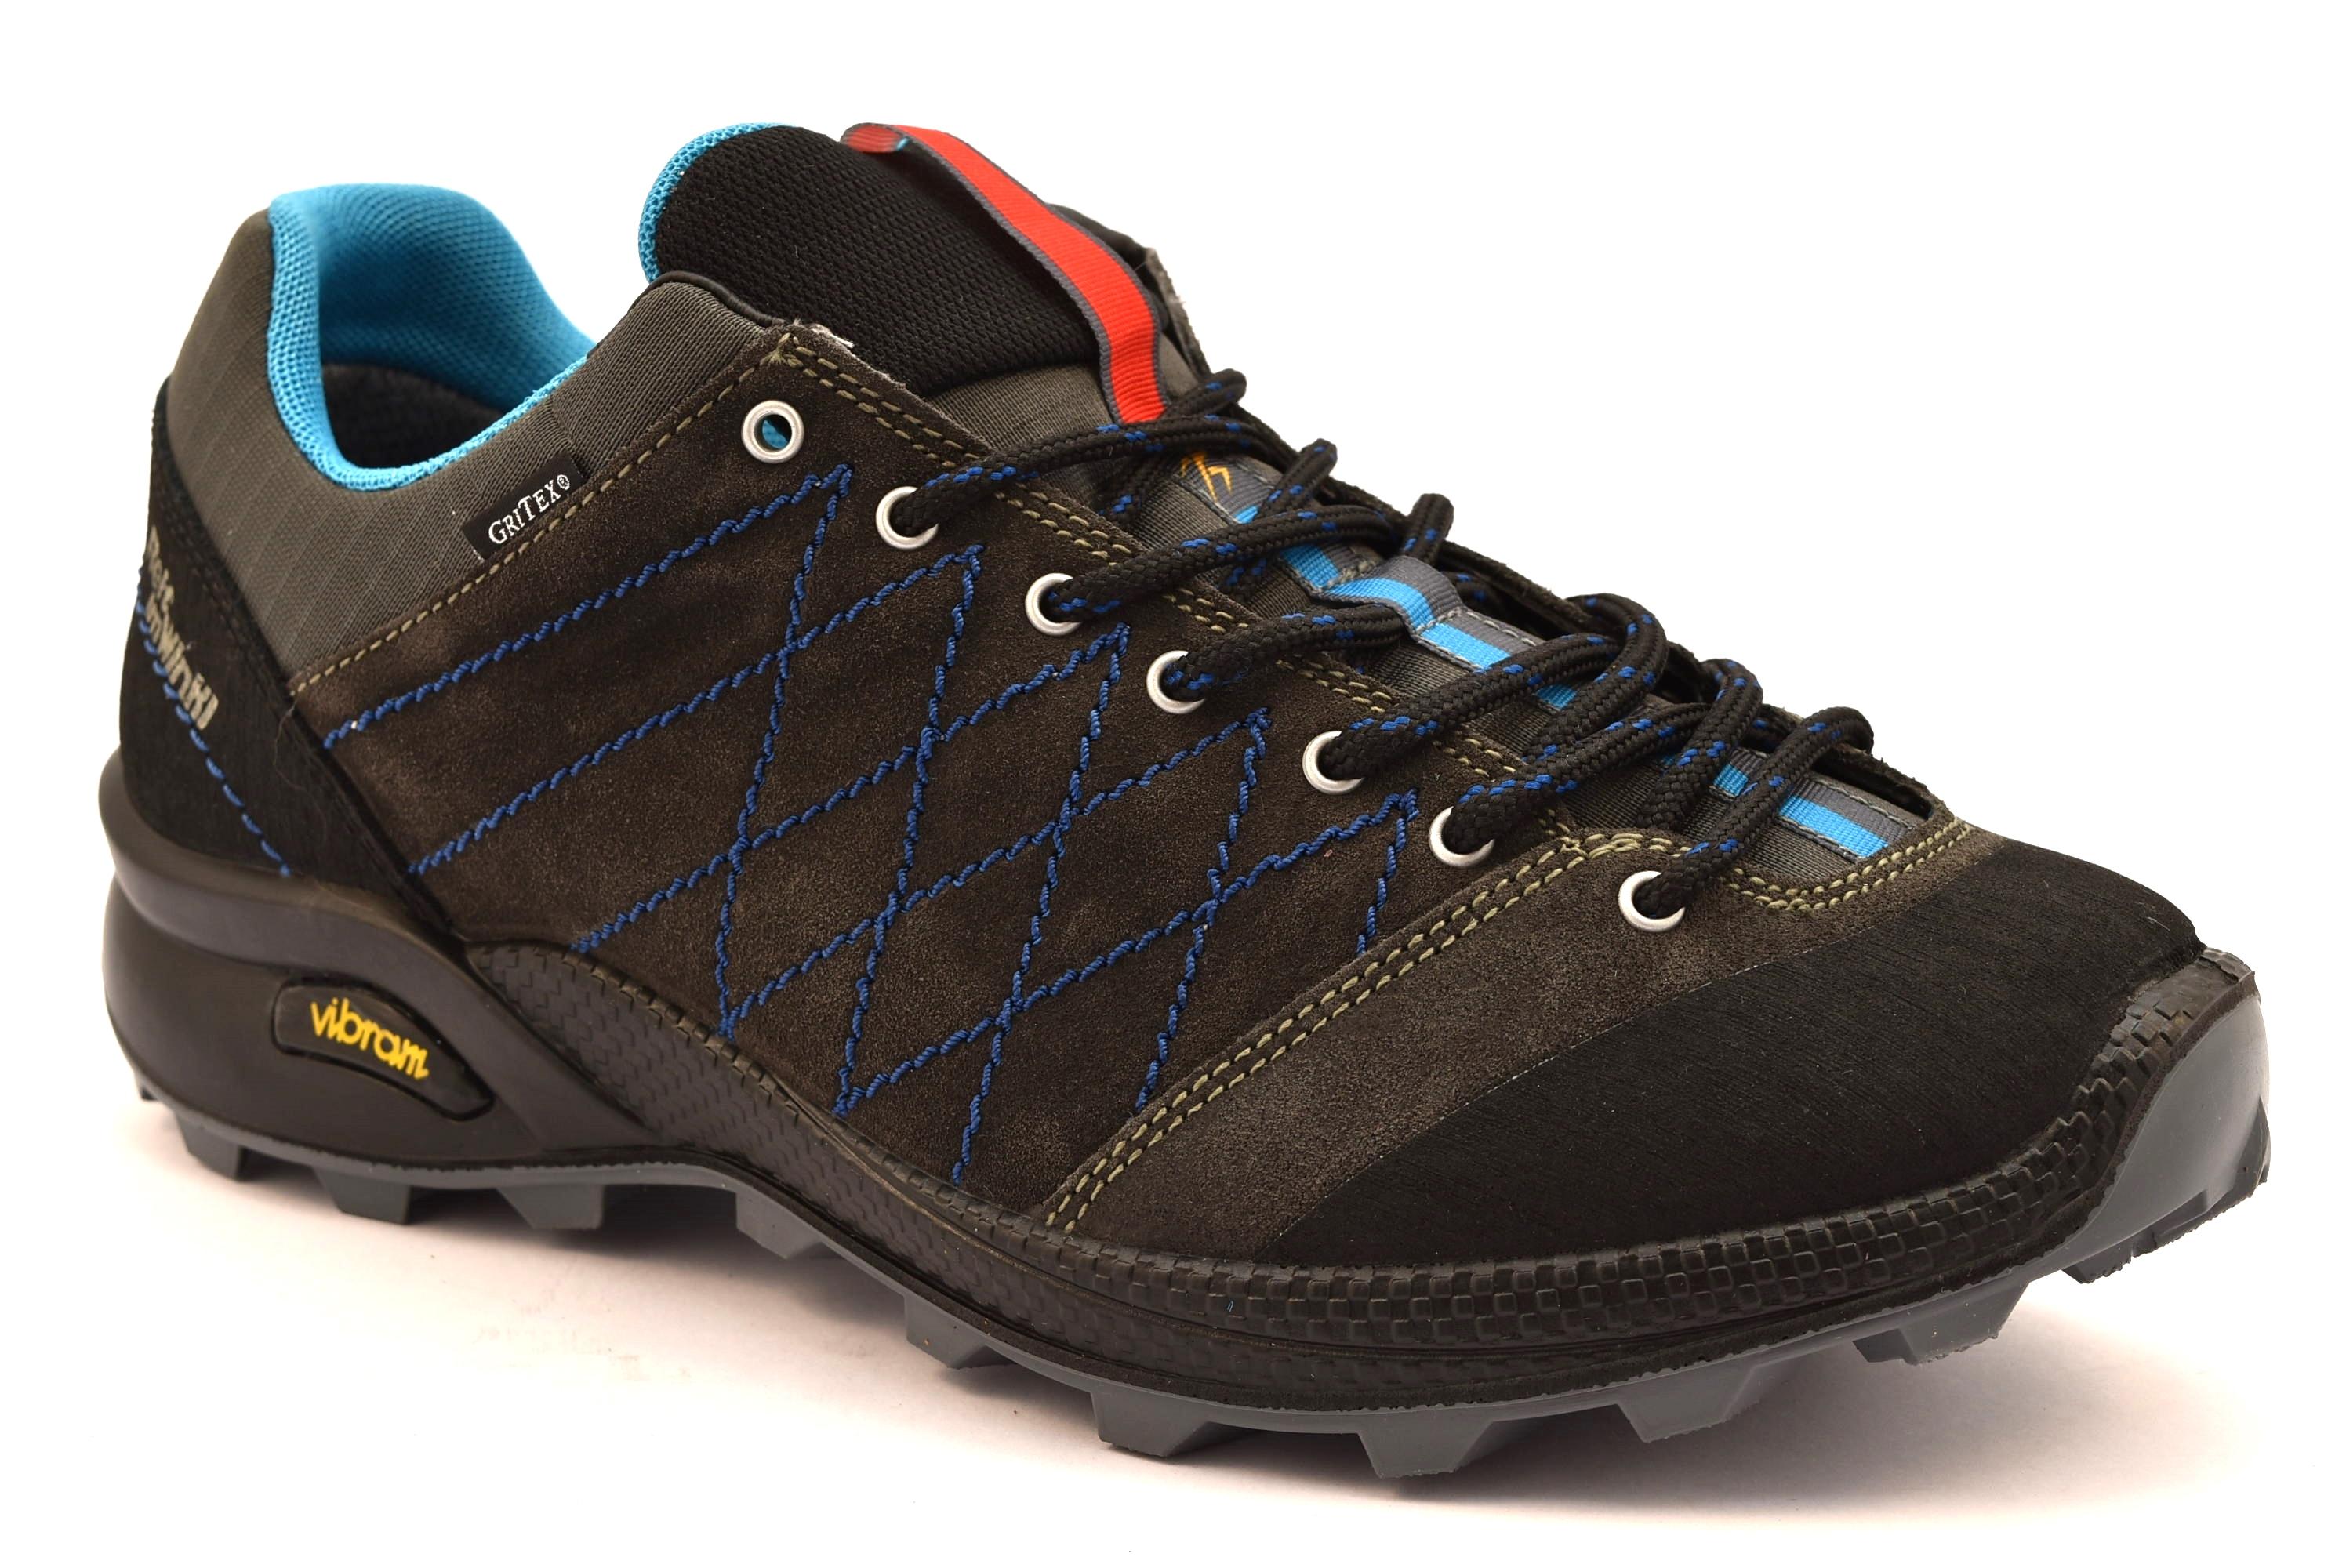 negozio ufficiale marchi riconosciuti vendita calda REIT IM WINKL 13133V12G NERO scarpe basse trekking uomo ...